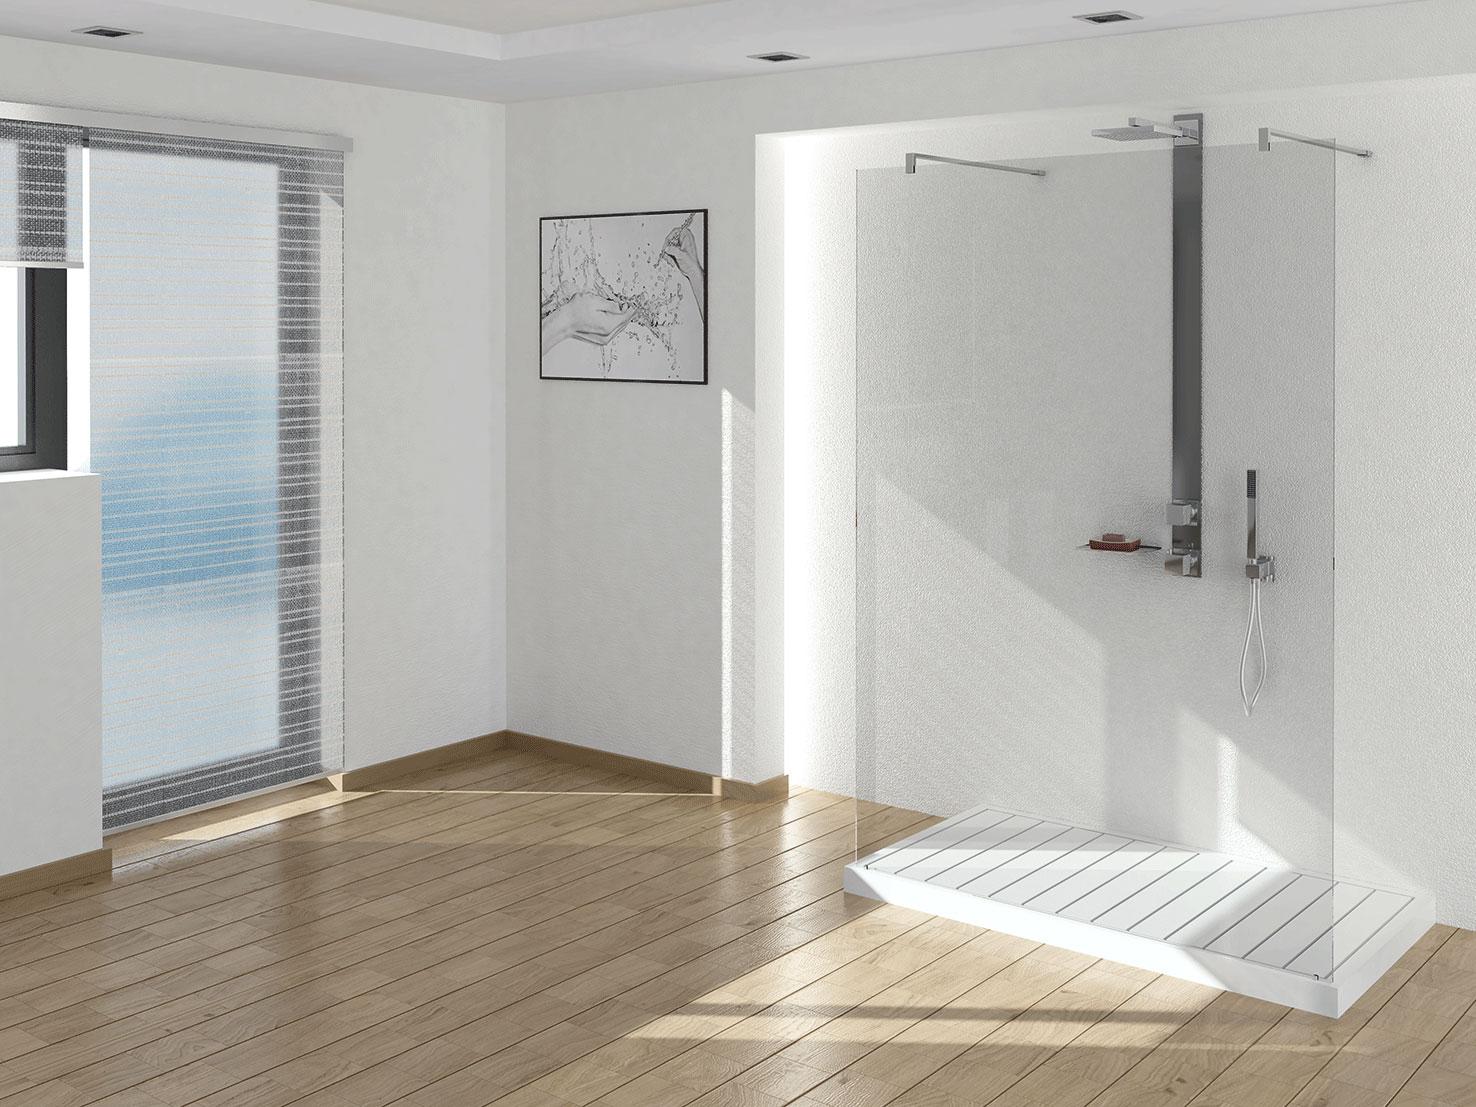 Lemust indoor perspective arredo bagno a bolzano